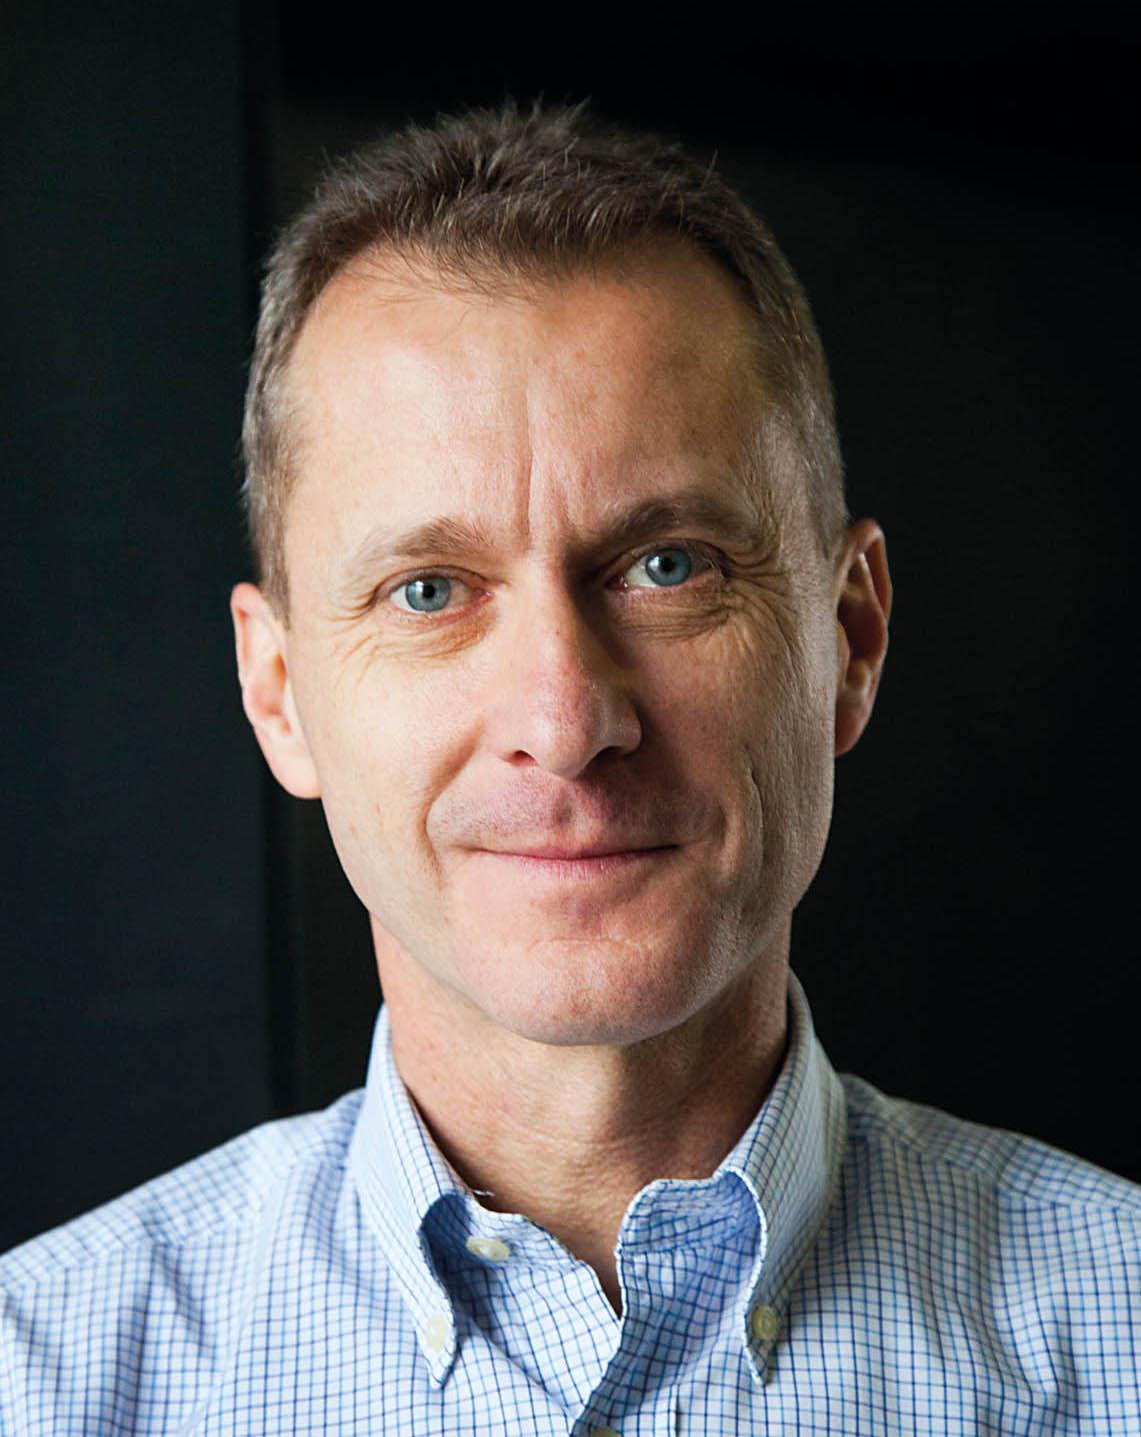 Jiří Štiller